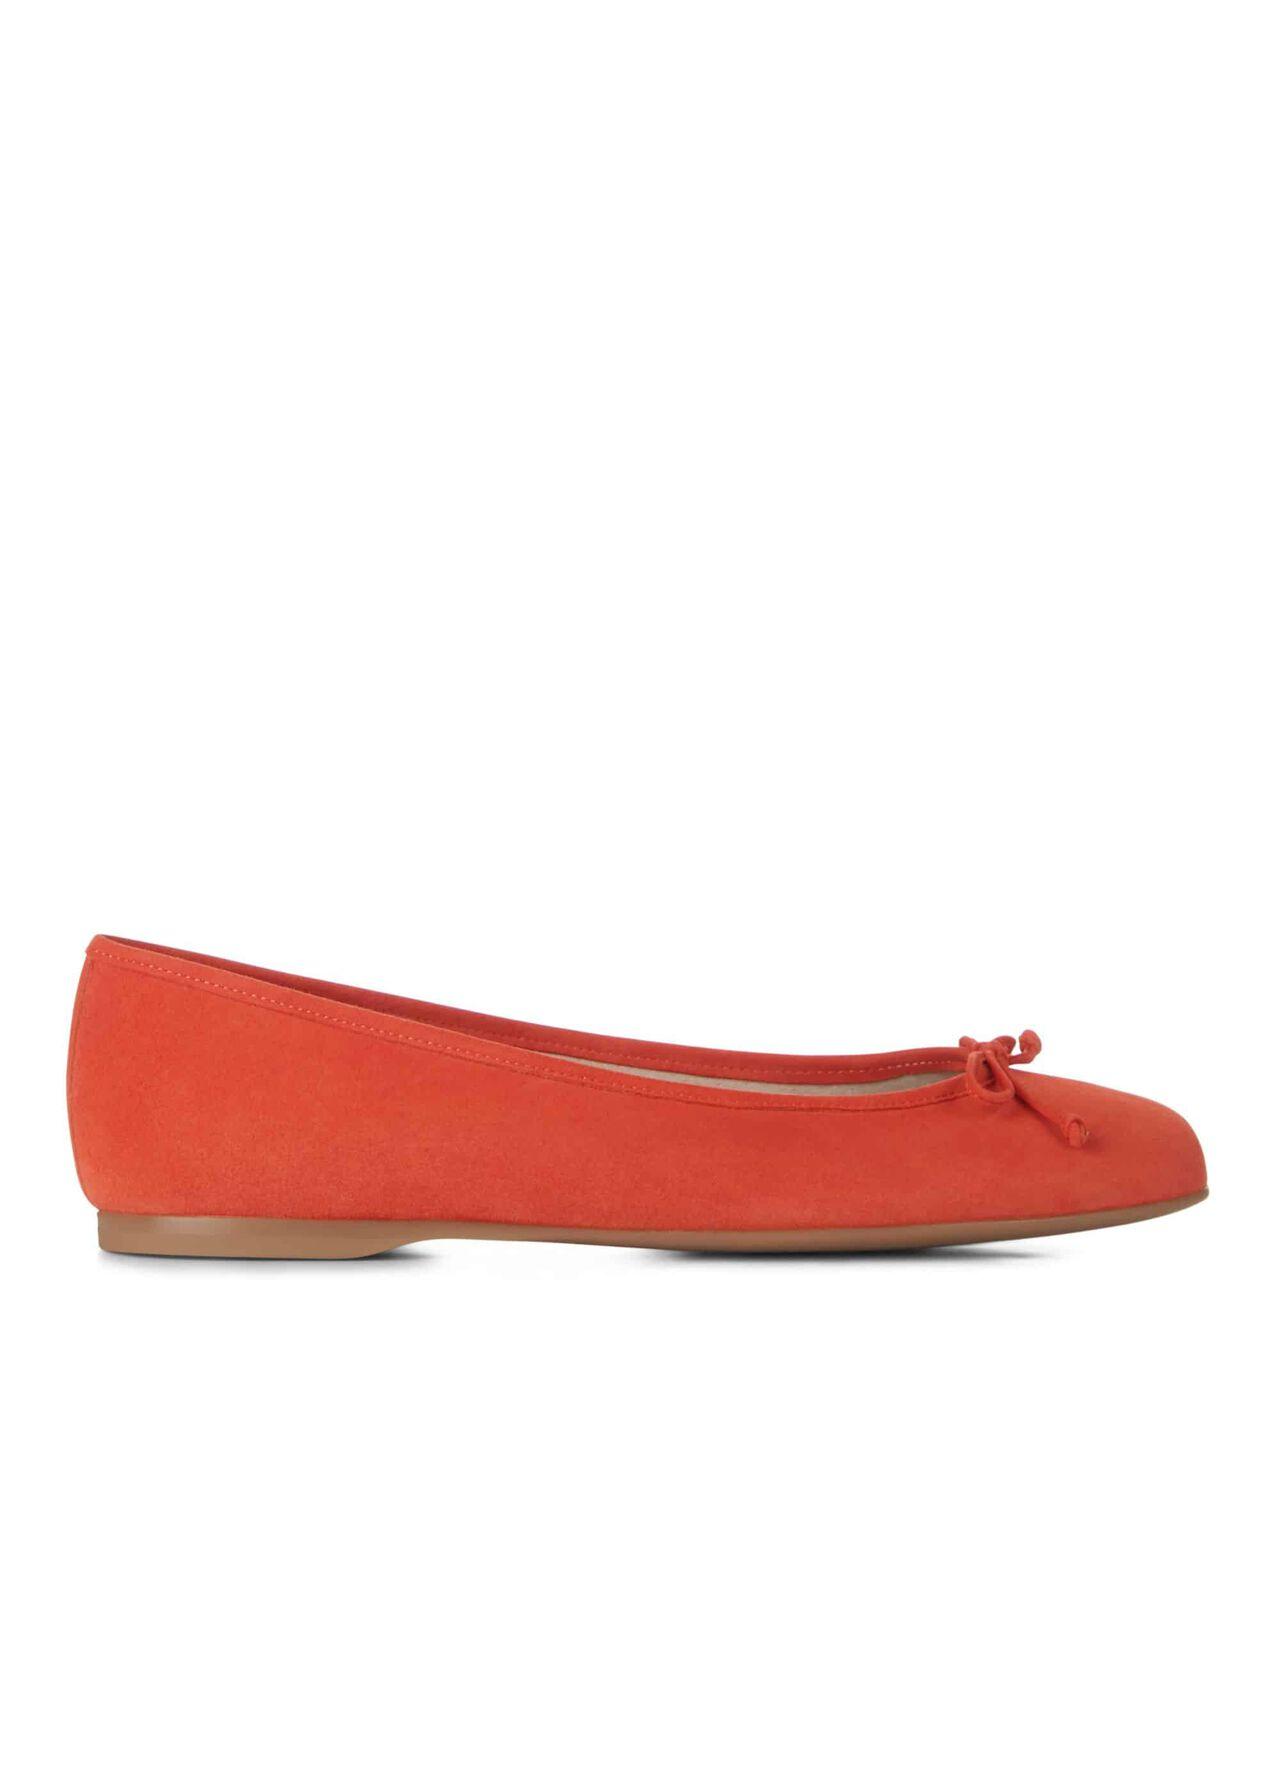 Prior Ballerina Flame Orange